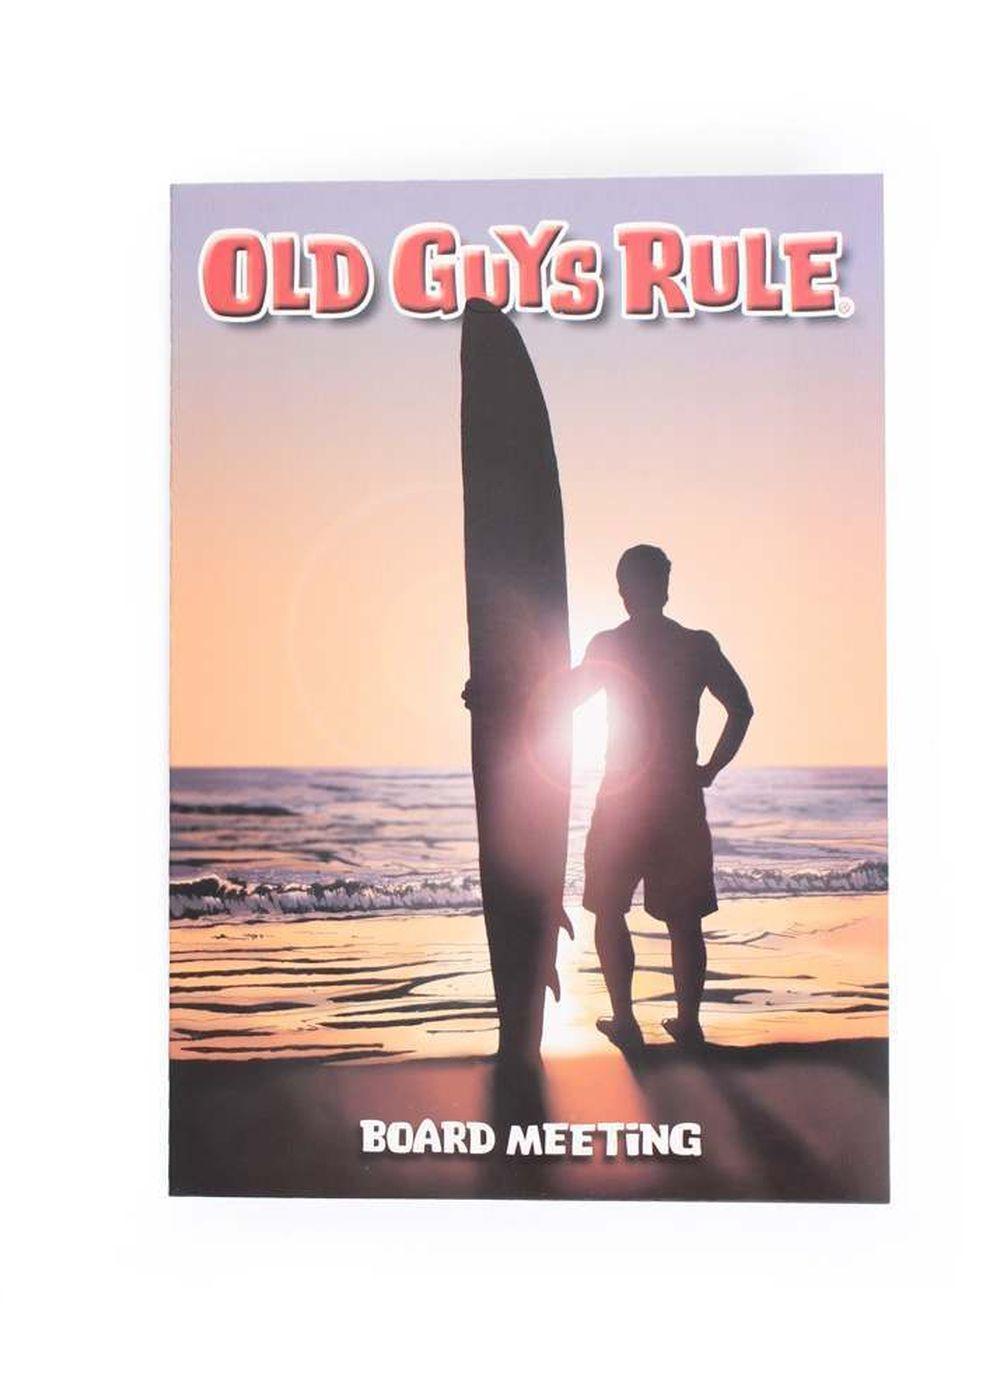 OLD GUYS RULE  BOARD MEETING  CARD